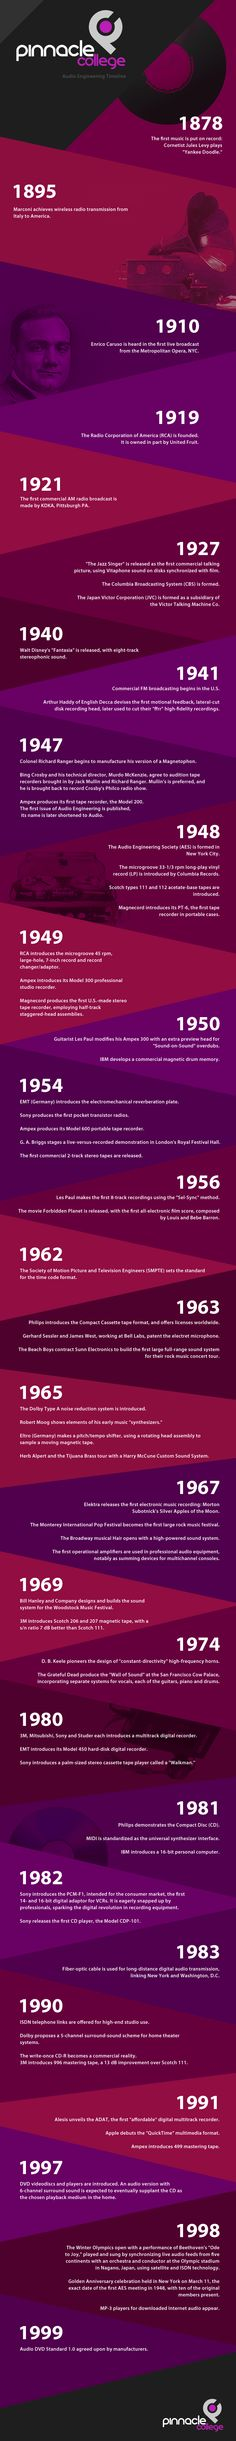 Infographic: History of Audio Engineering